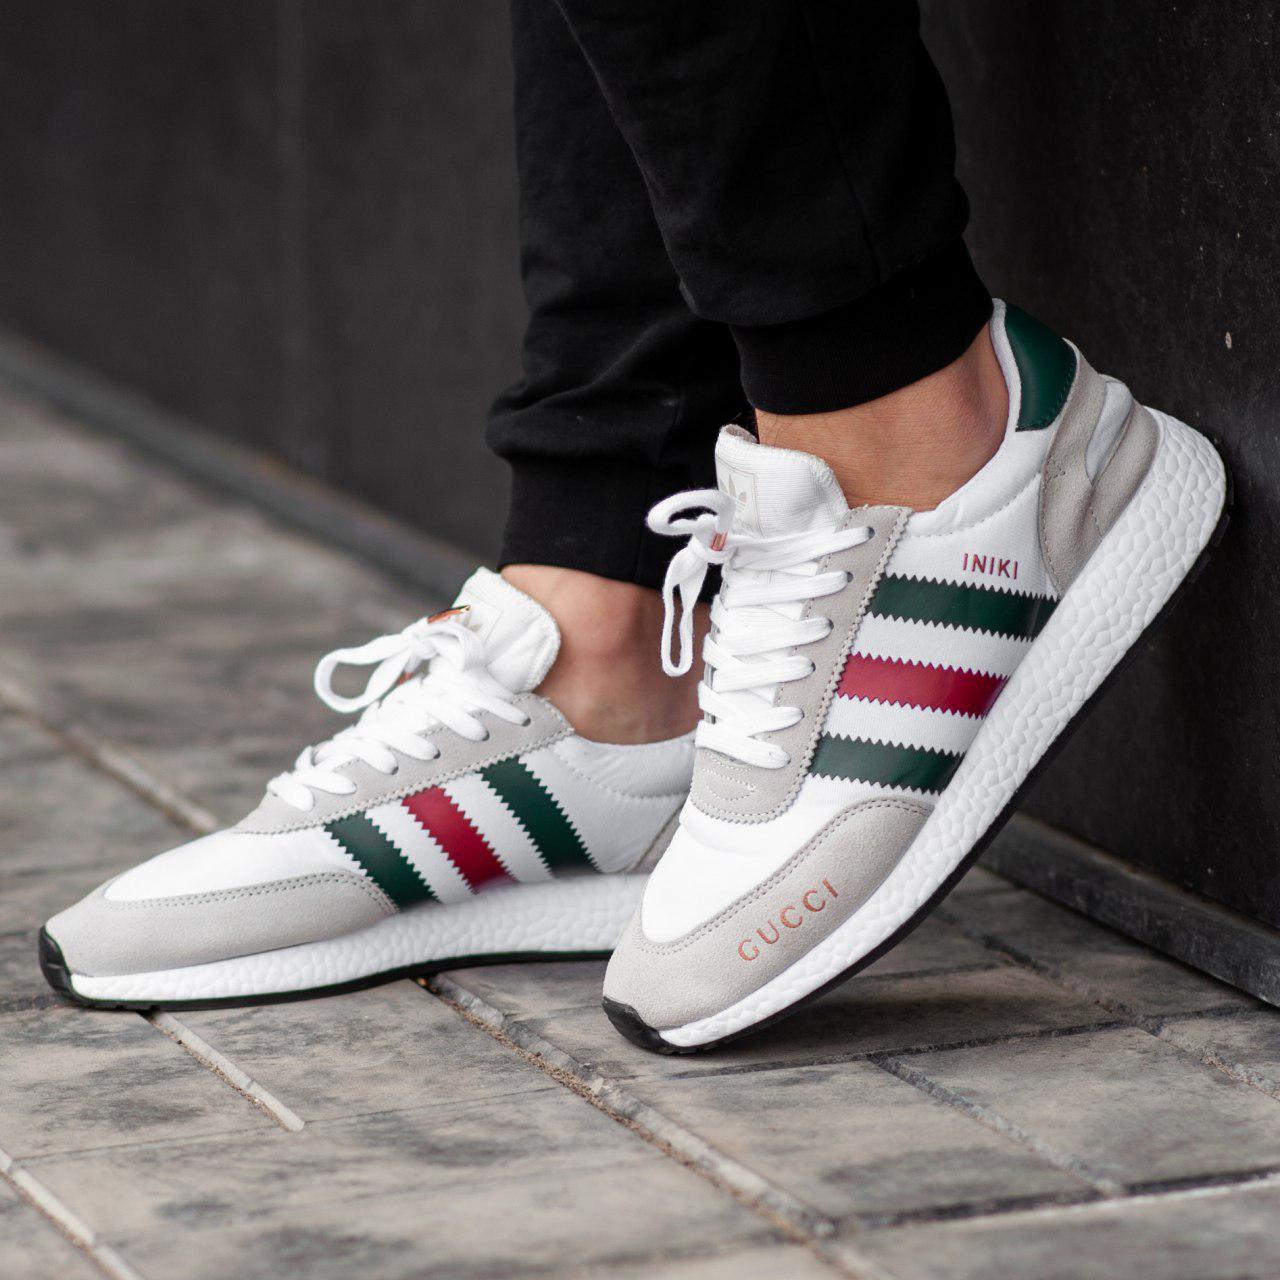 53521f331 Мужские кроссовки Adidas Iniki x Gucci White (Реплика ААА+) - Магазин  брендовой обуви